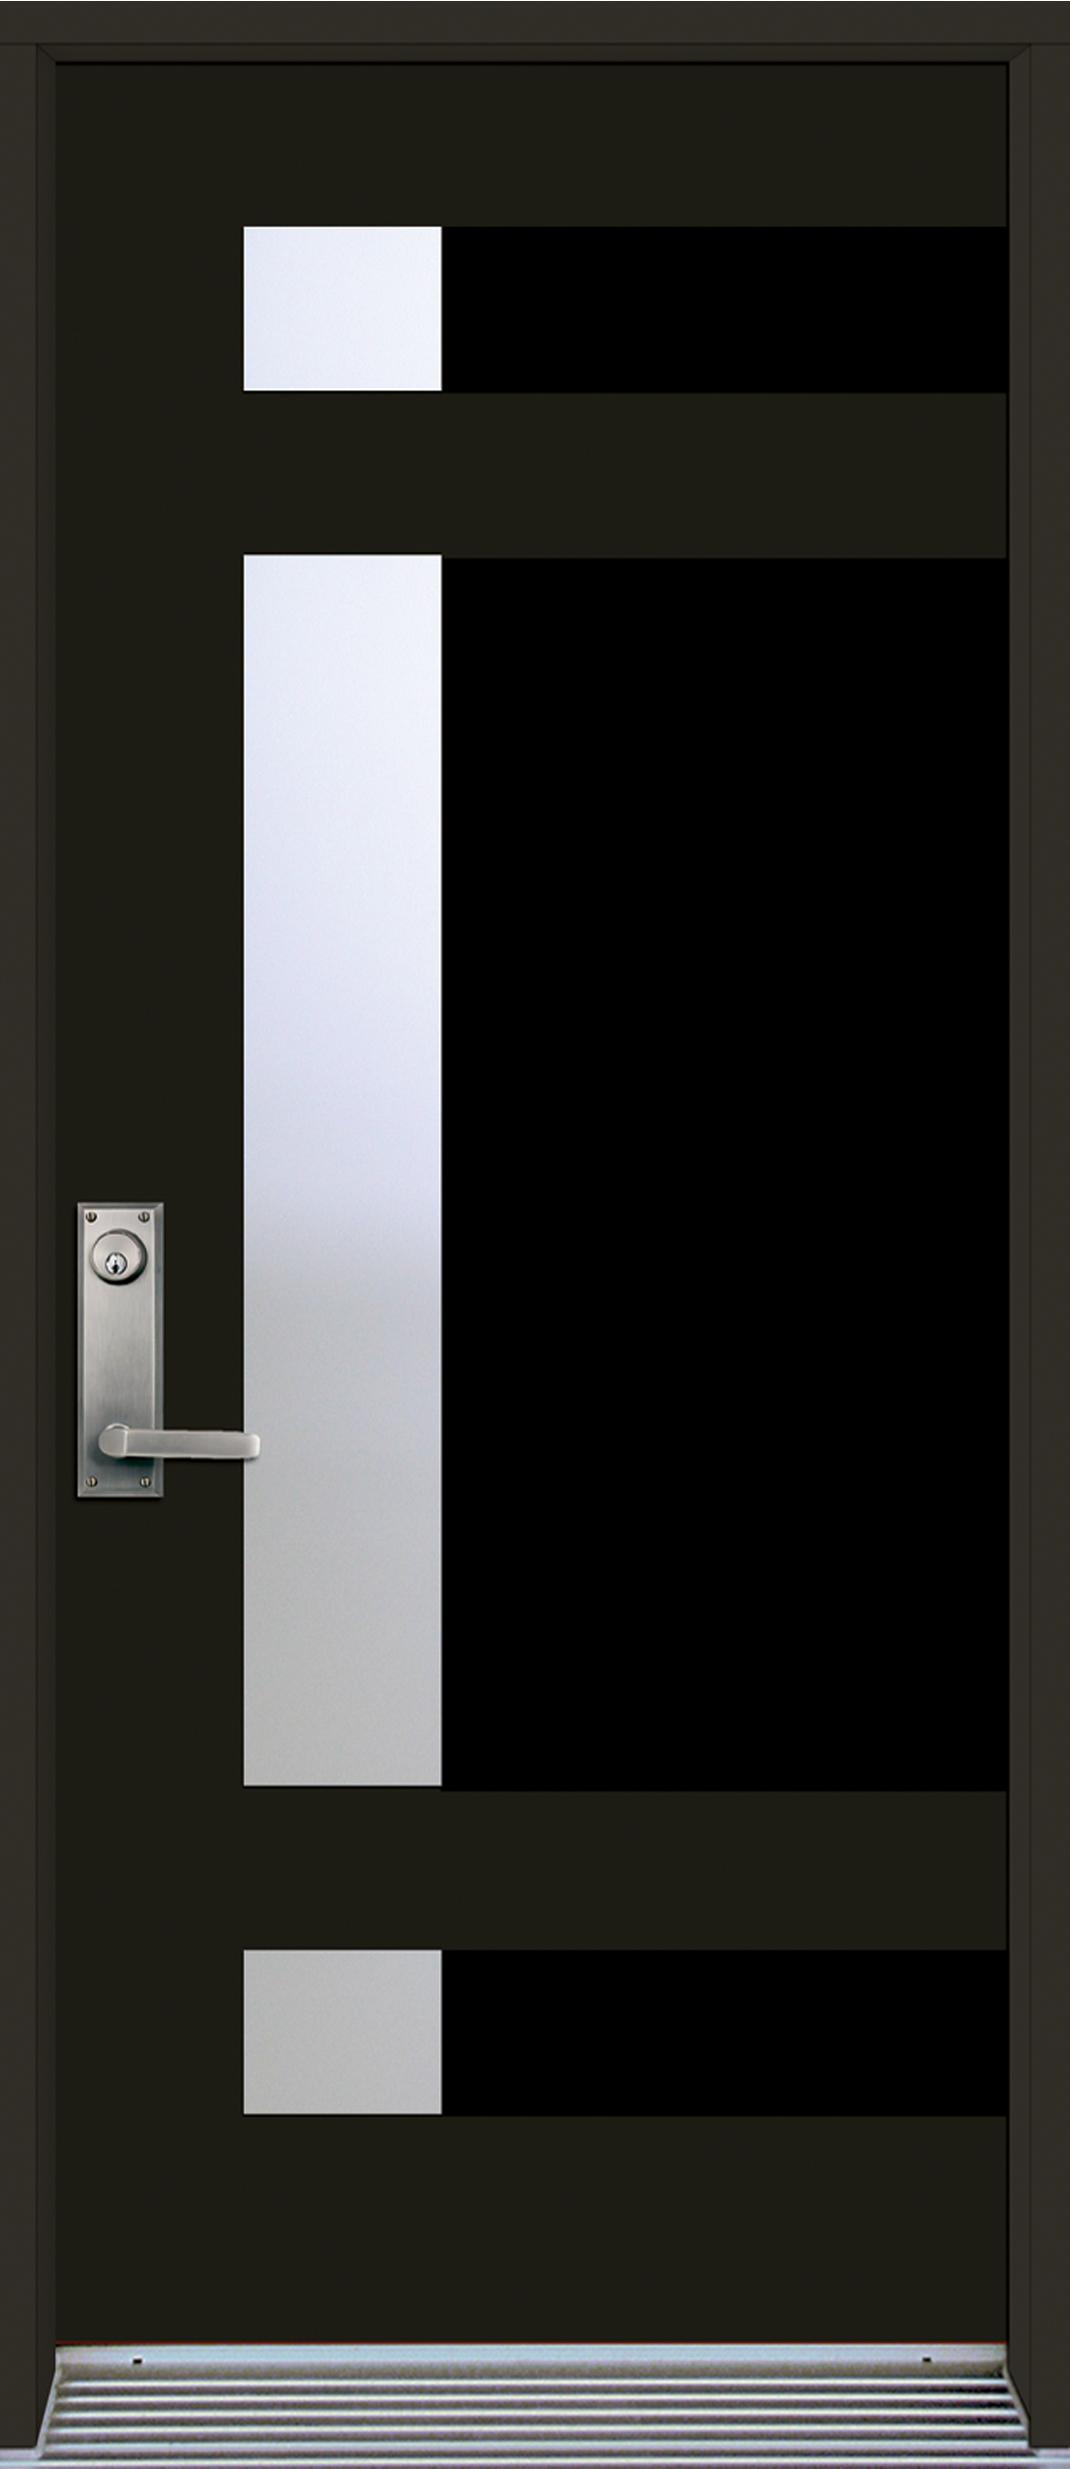 Mod le de porte contemporaine epsilon5 portatec for Modele de porte